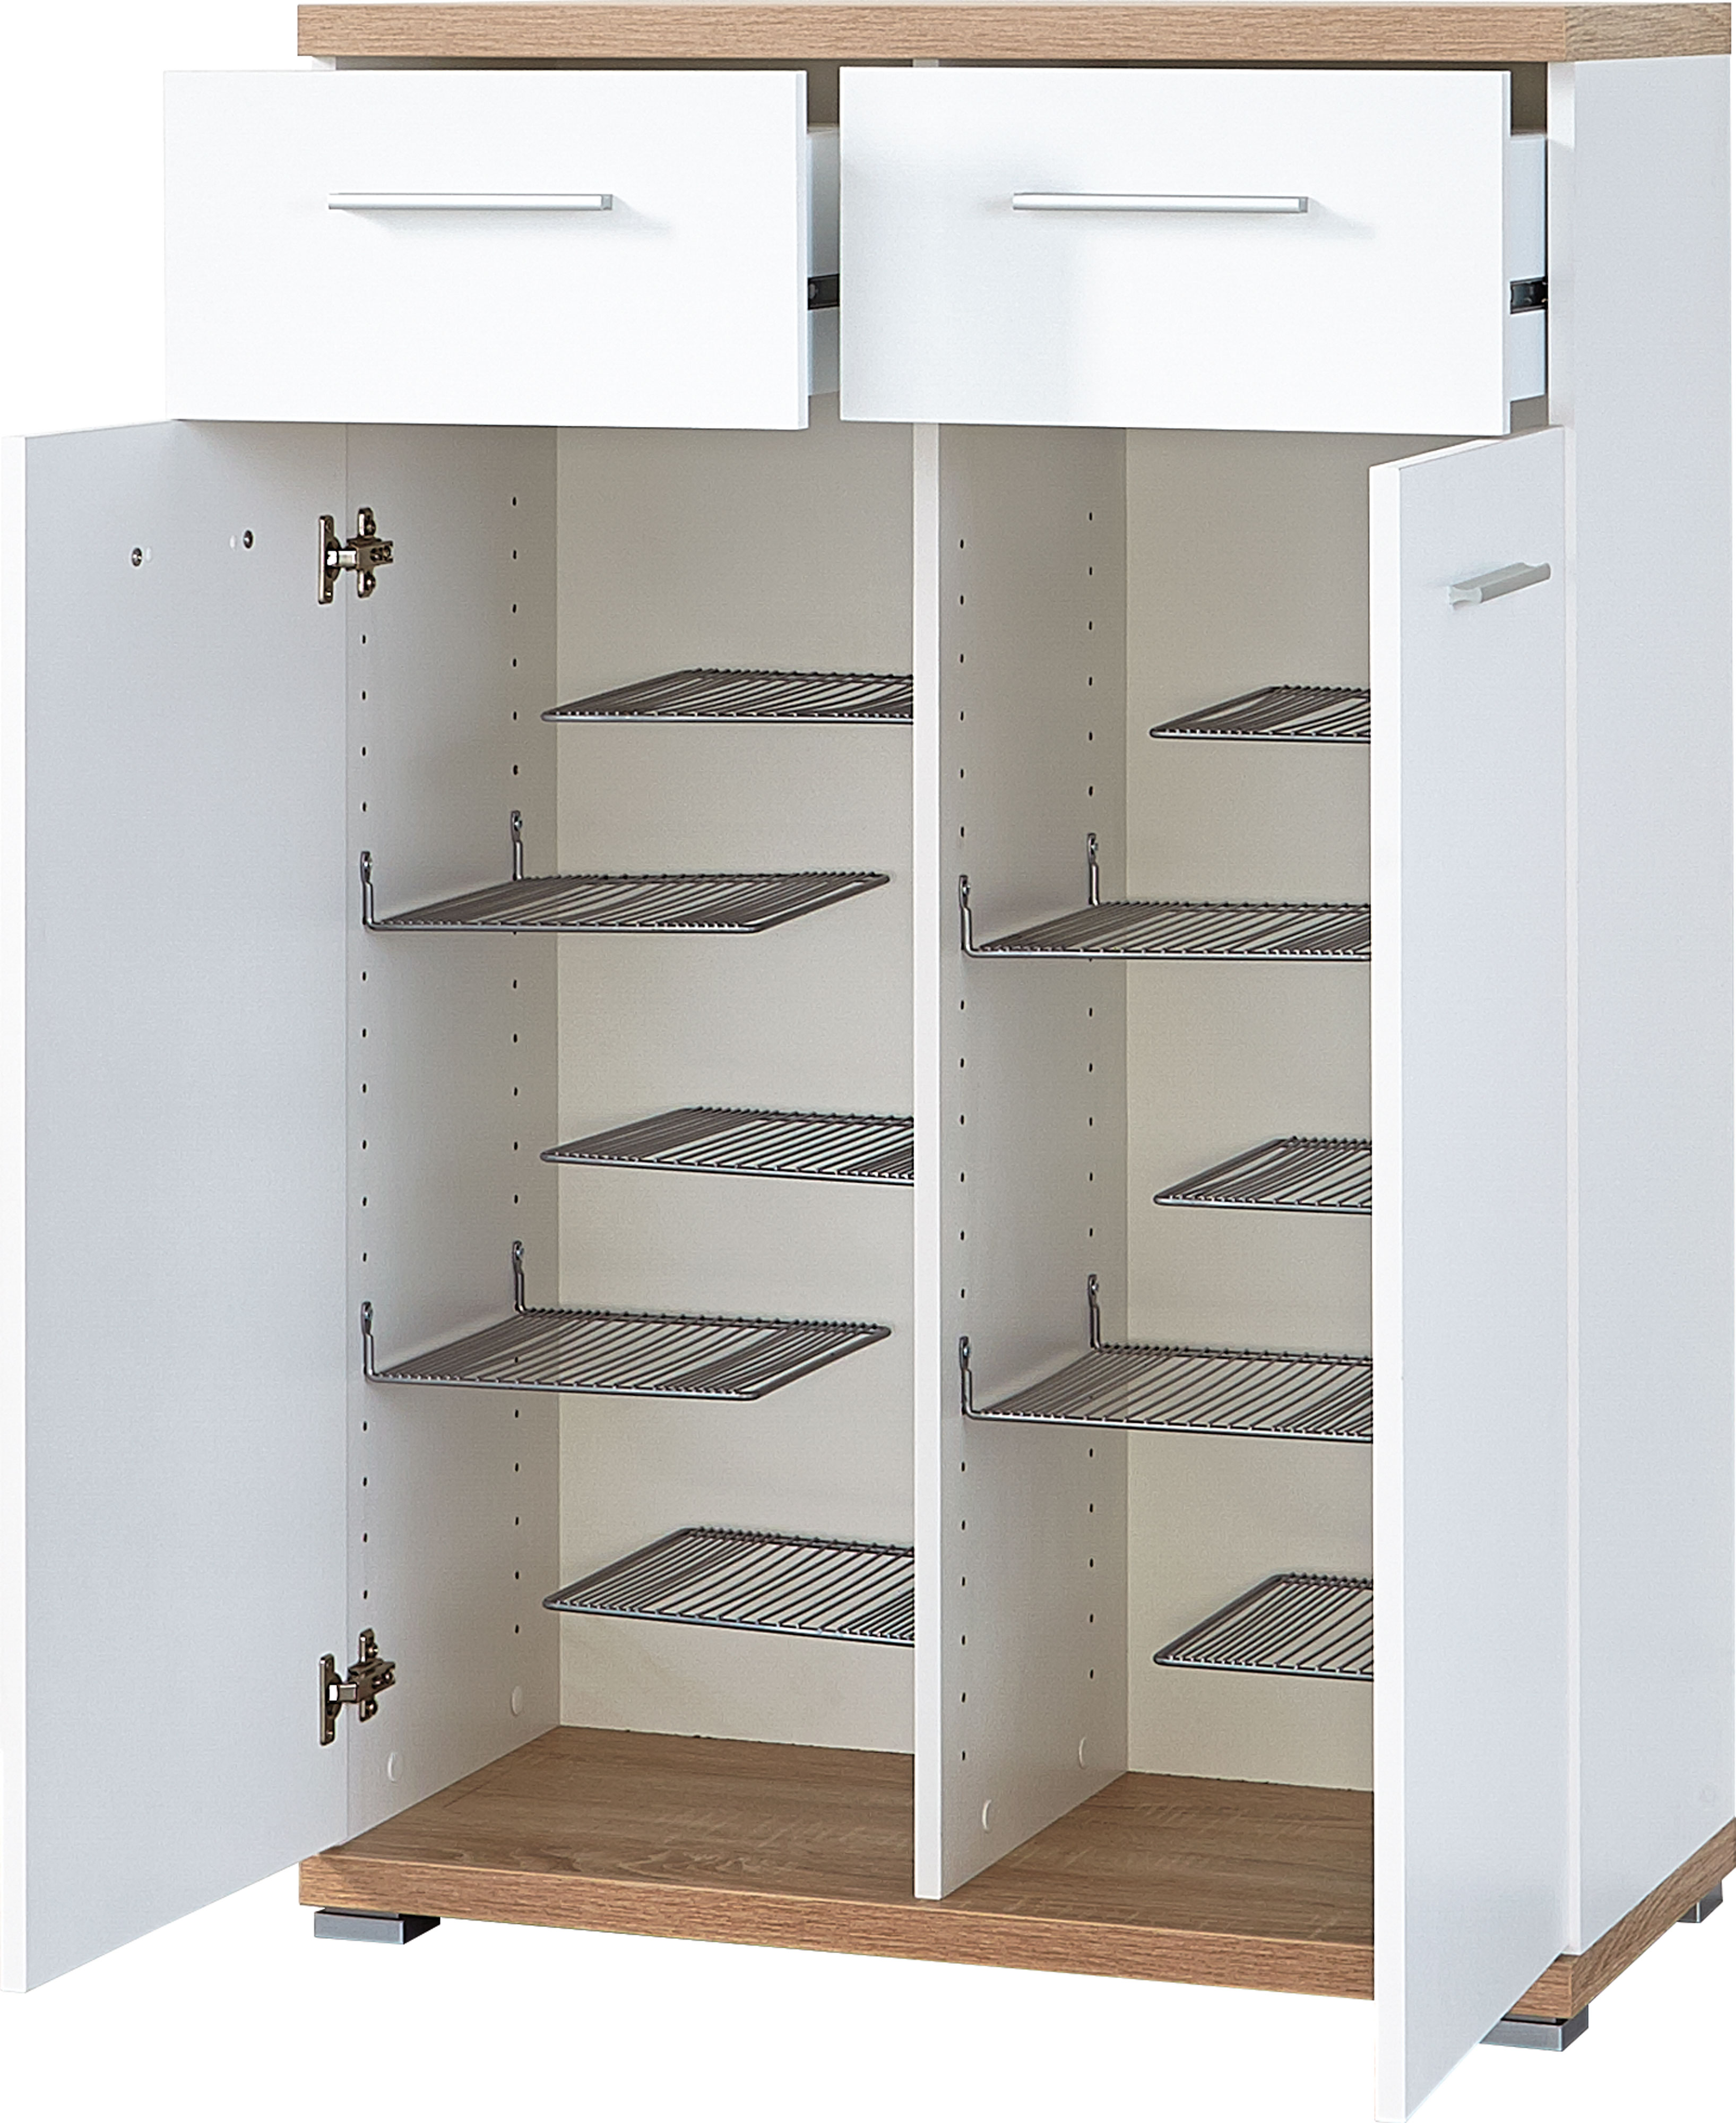 schuhschrank schuhkommode schuhregal ablage mod gm720. Black Bedroom Furniture Sets. Home Design Ideas